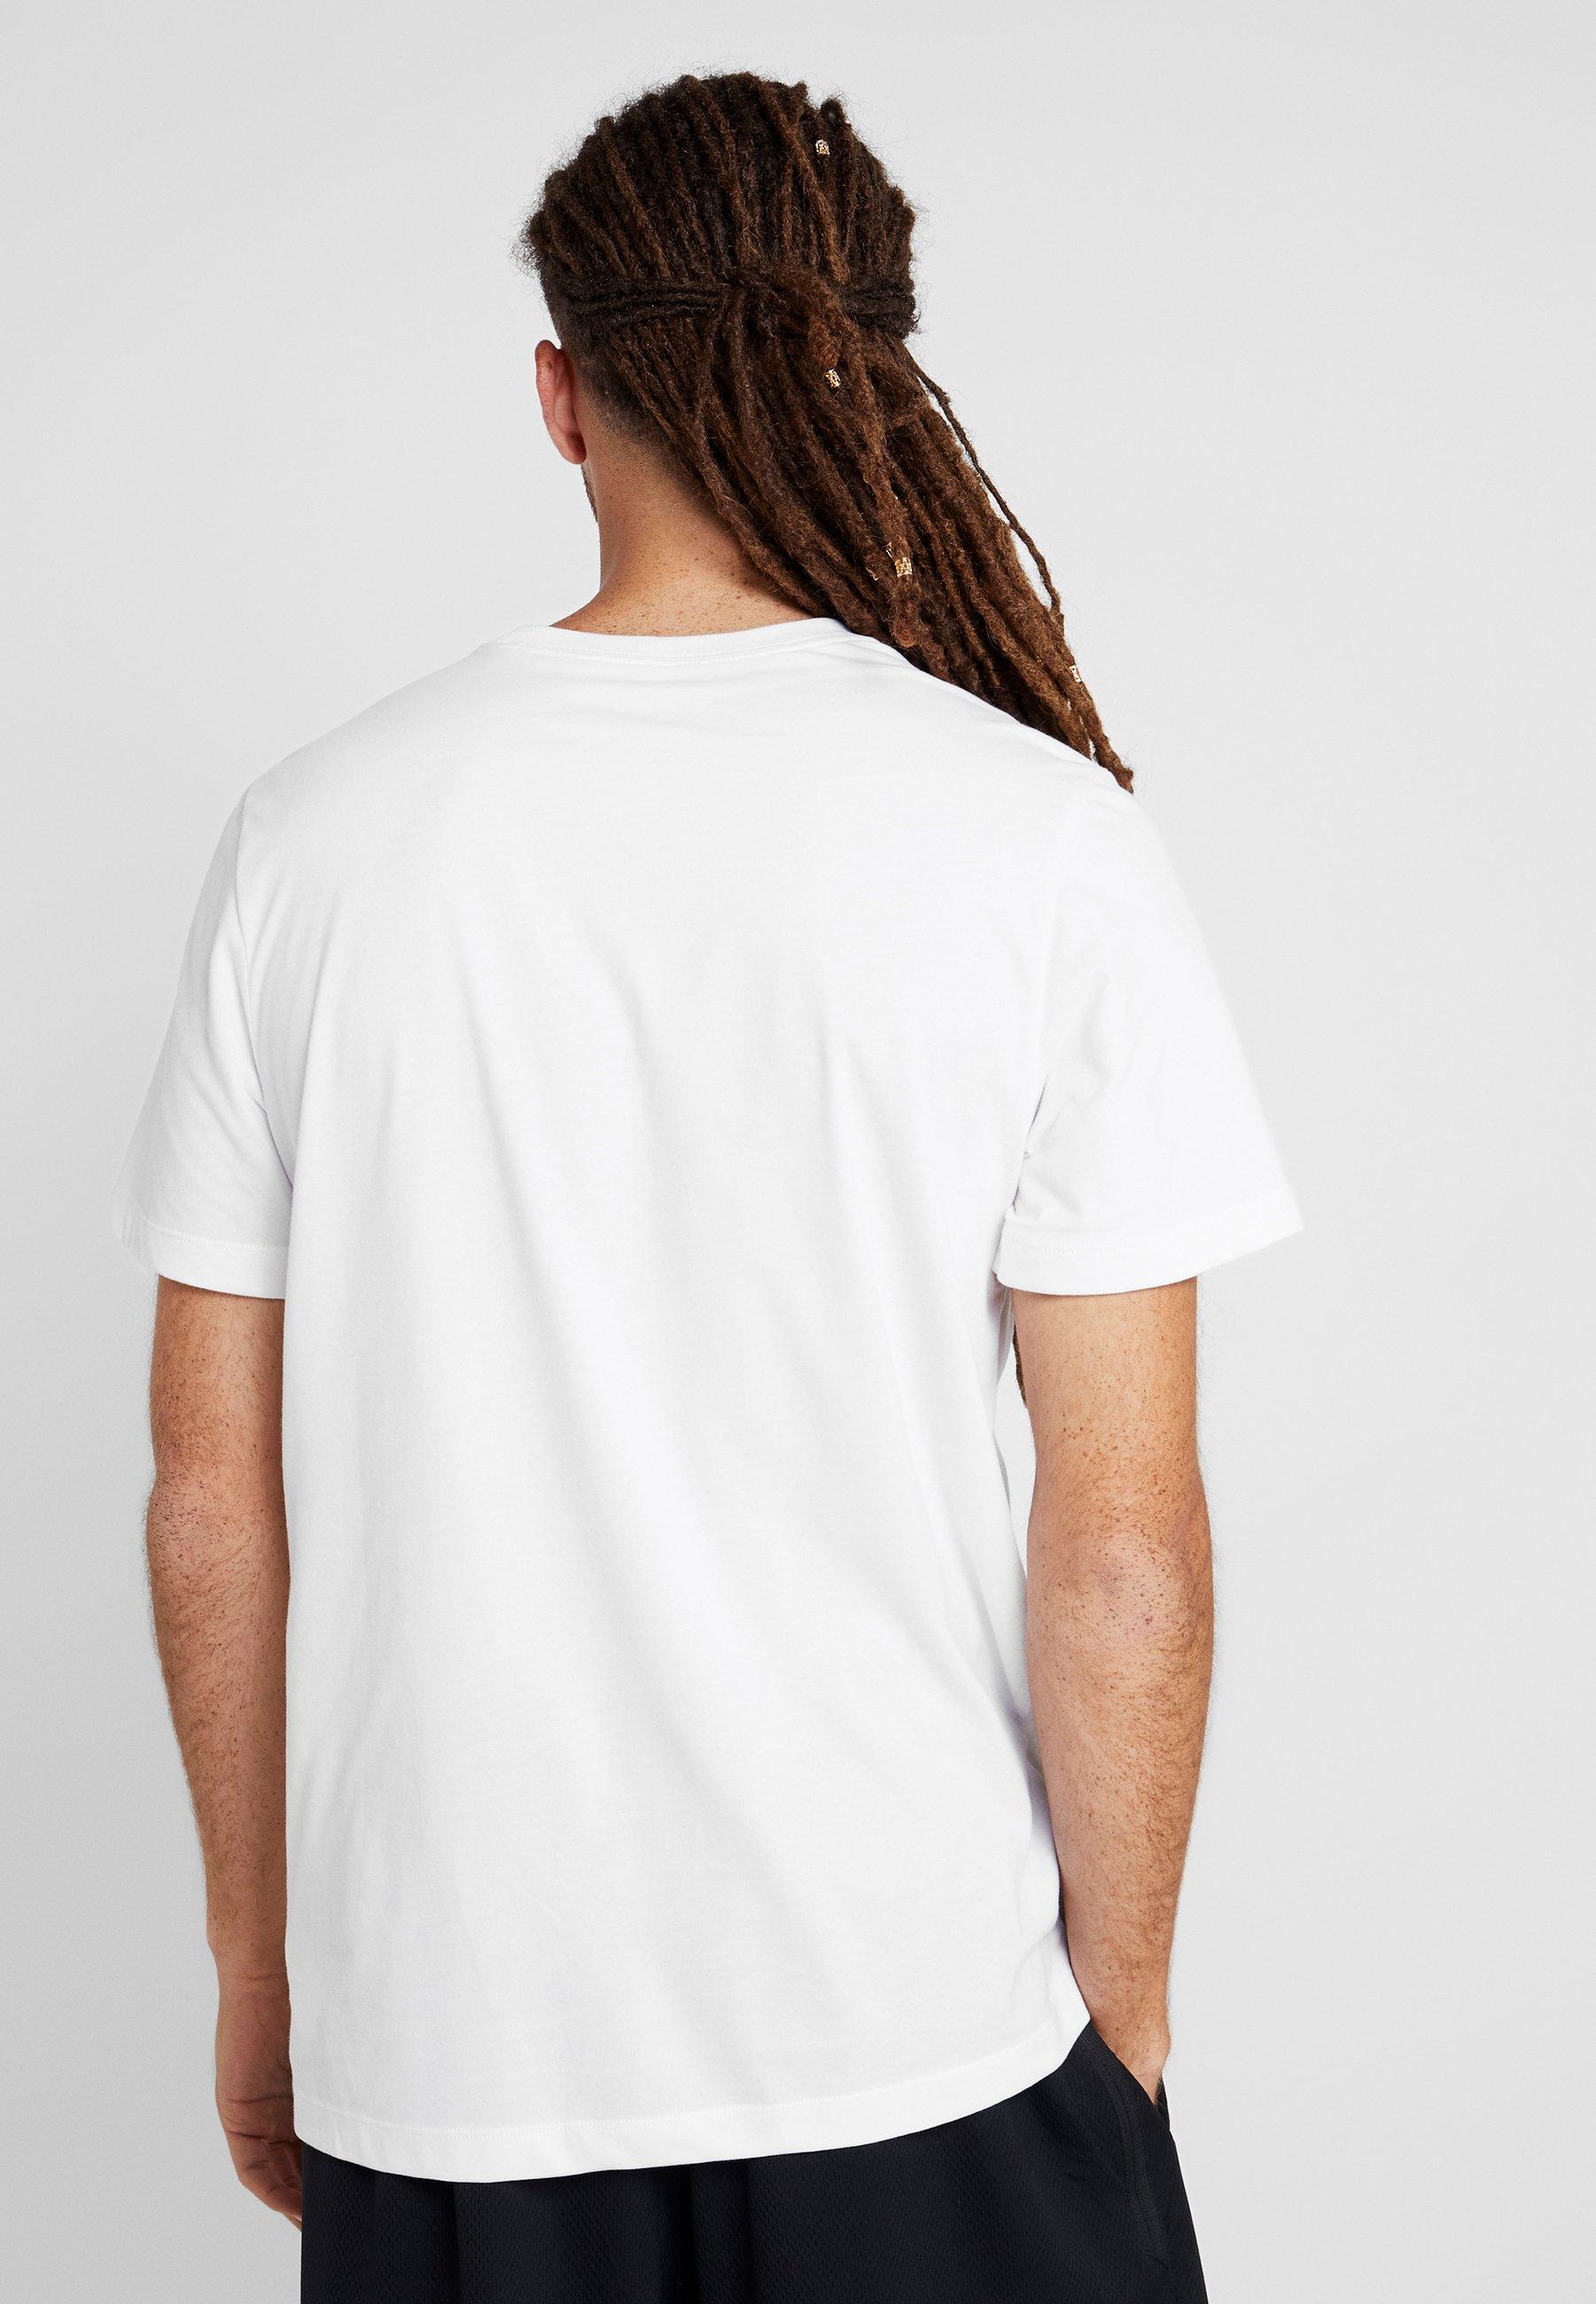 Imprimé Nike Nba White Performance TeeT shirt dCrxWBoe